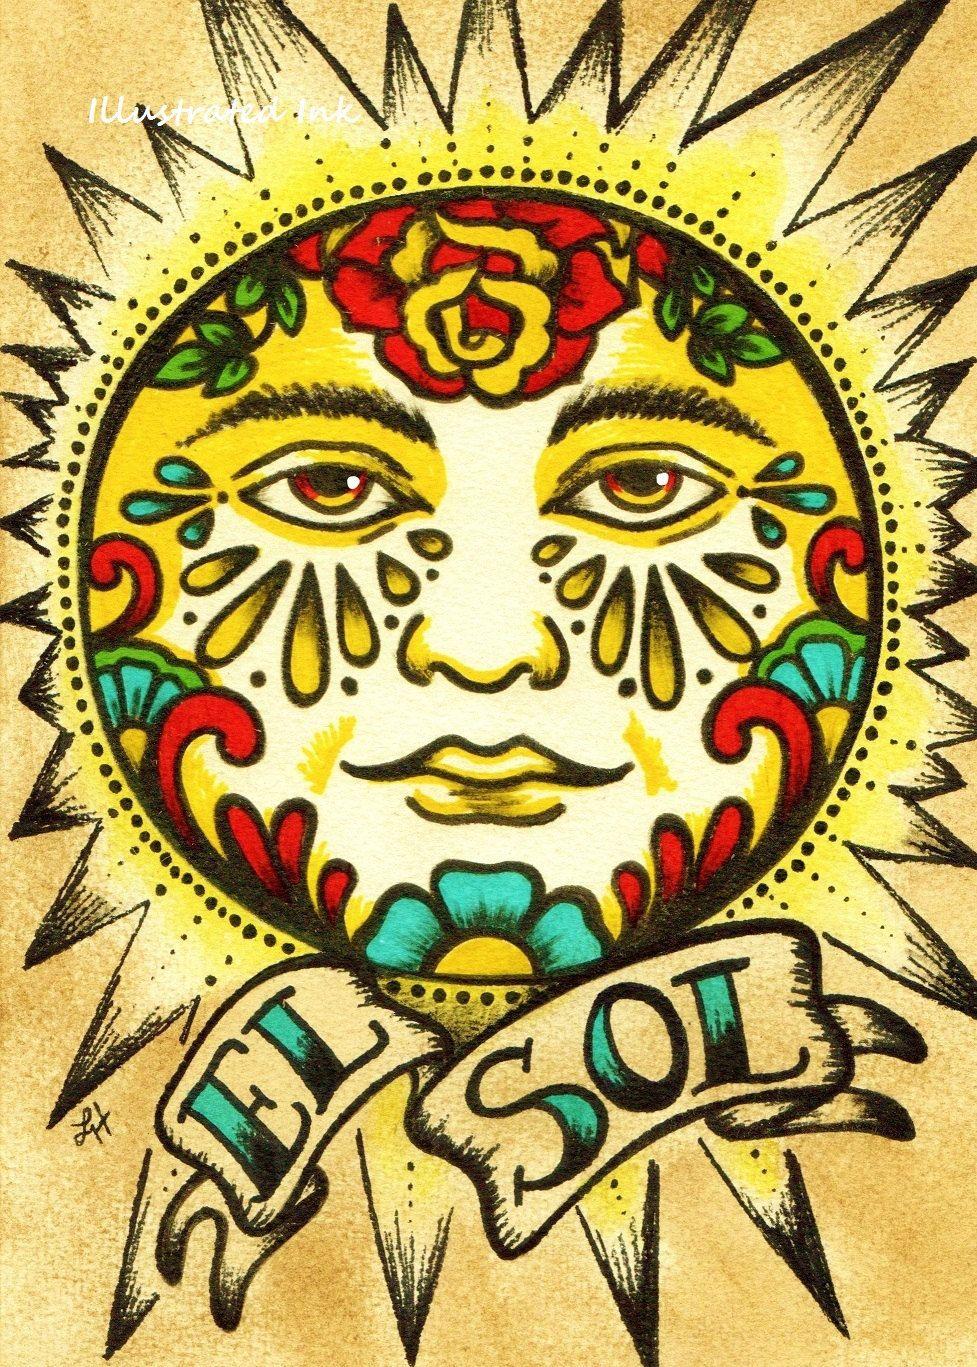 Mexican Folk Art Sun EL SOL Loteria Print 5 x 7, 8 x 10 or 11 x 14 ...